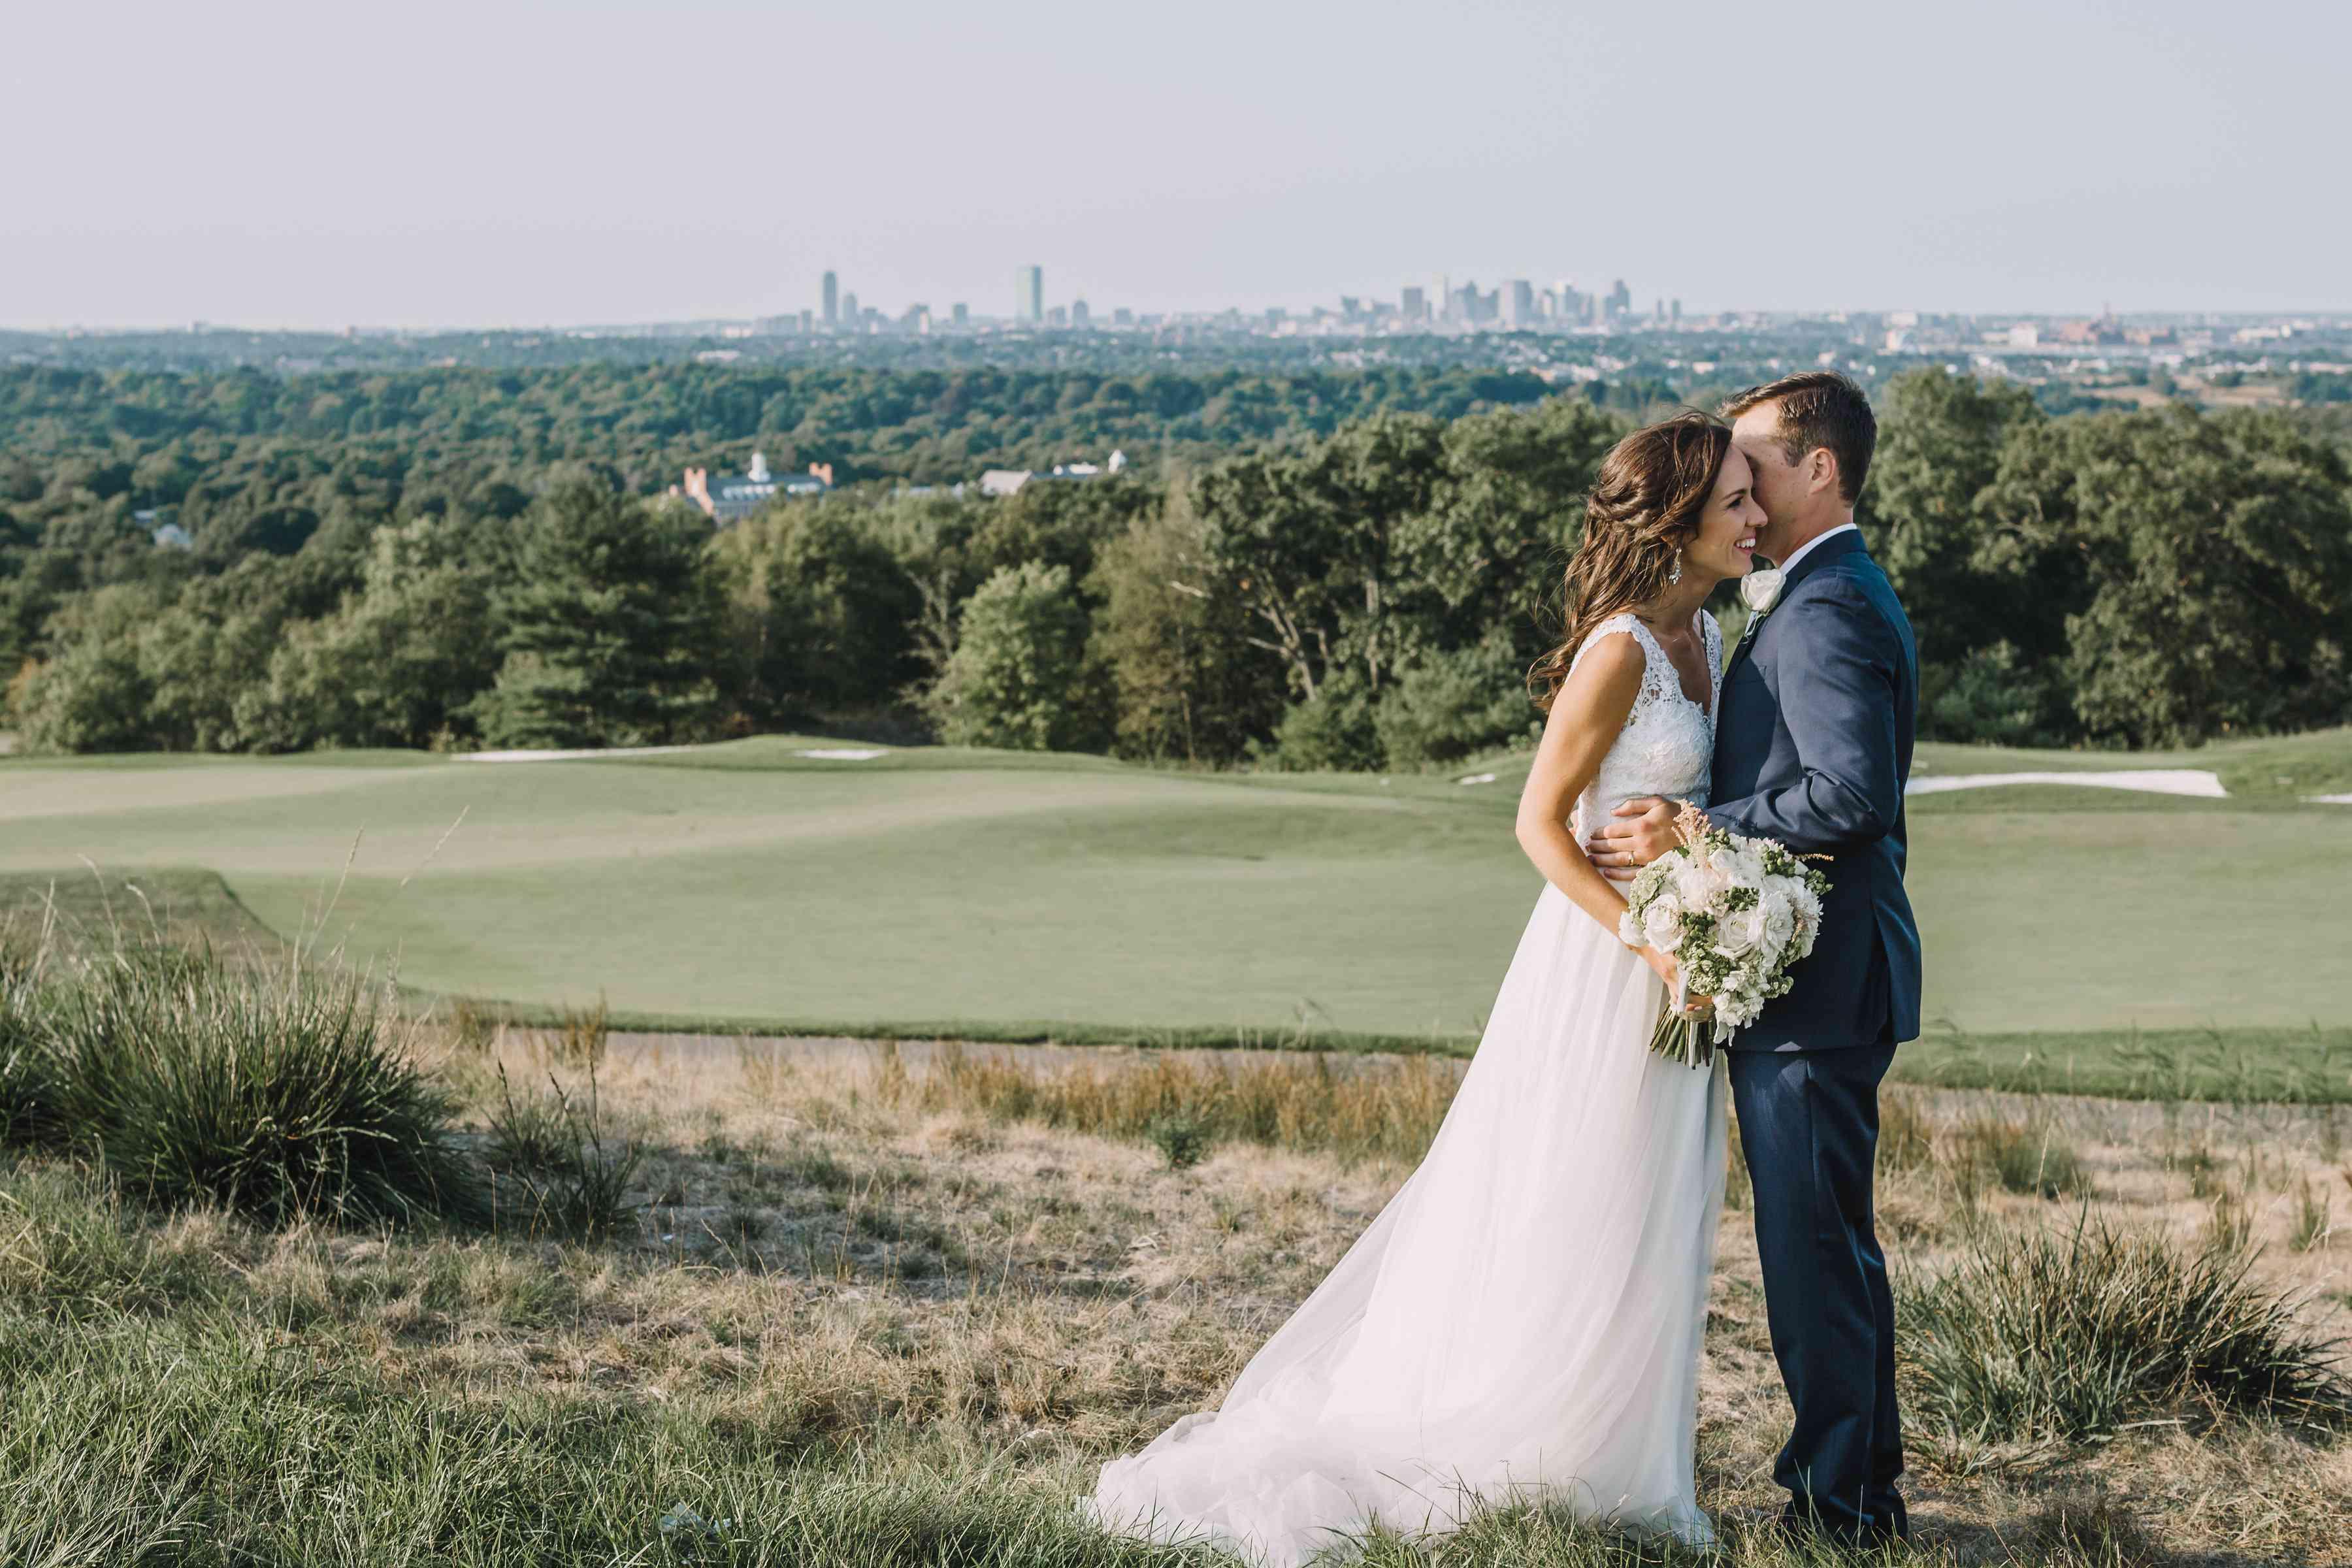 <p>Wedding photo at Granite Links Golf Club</p>